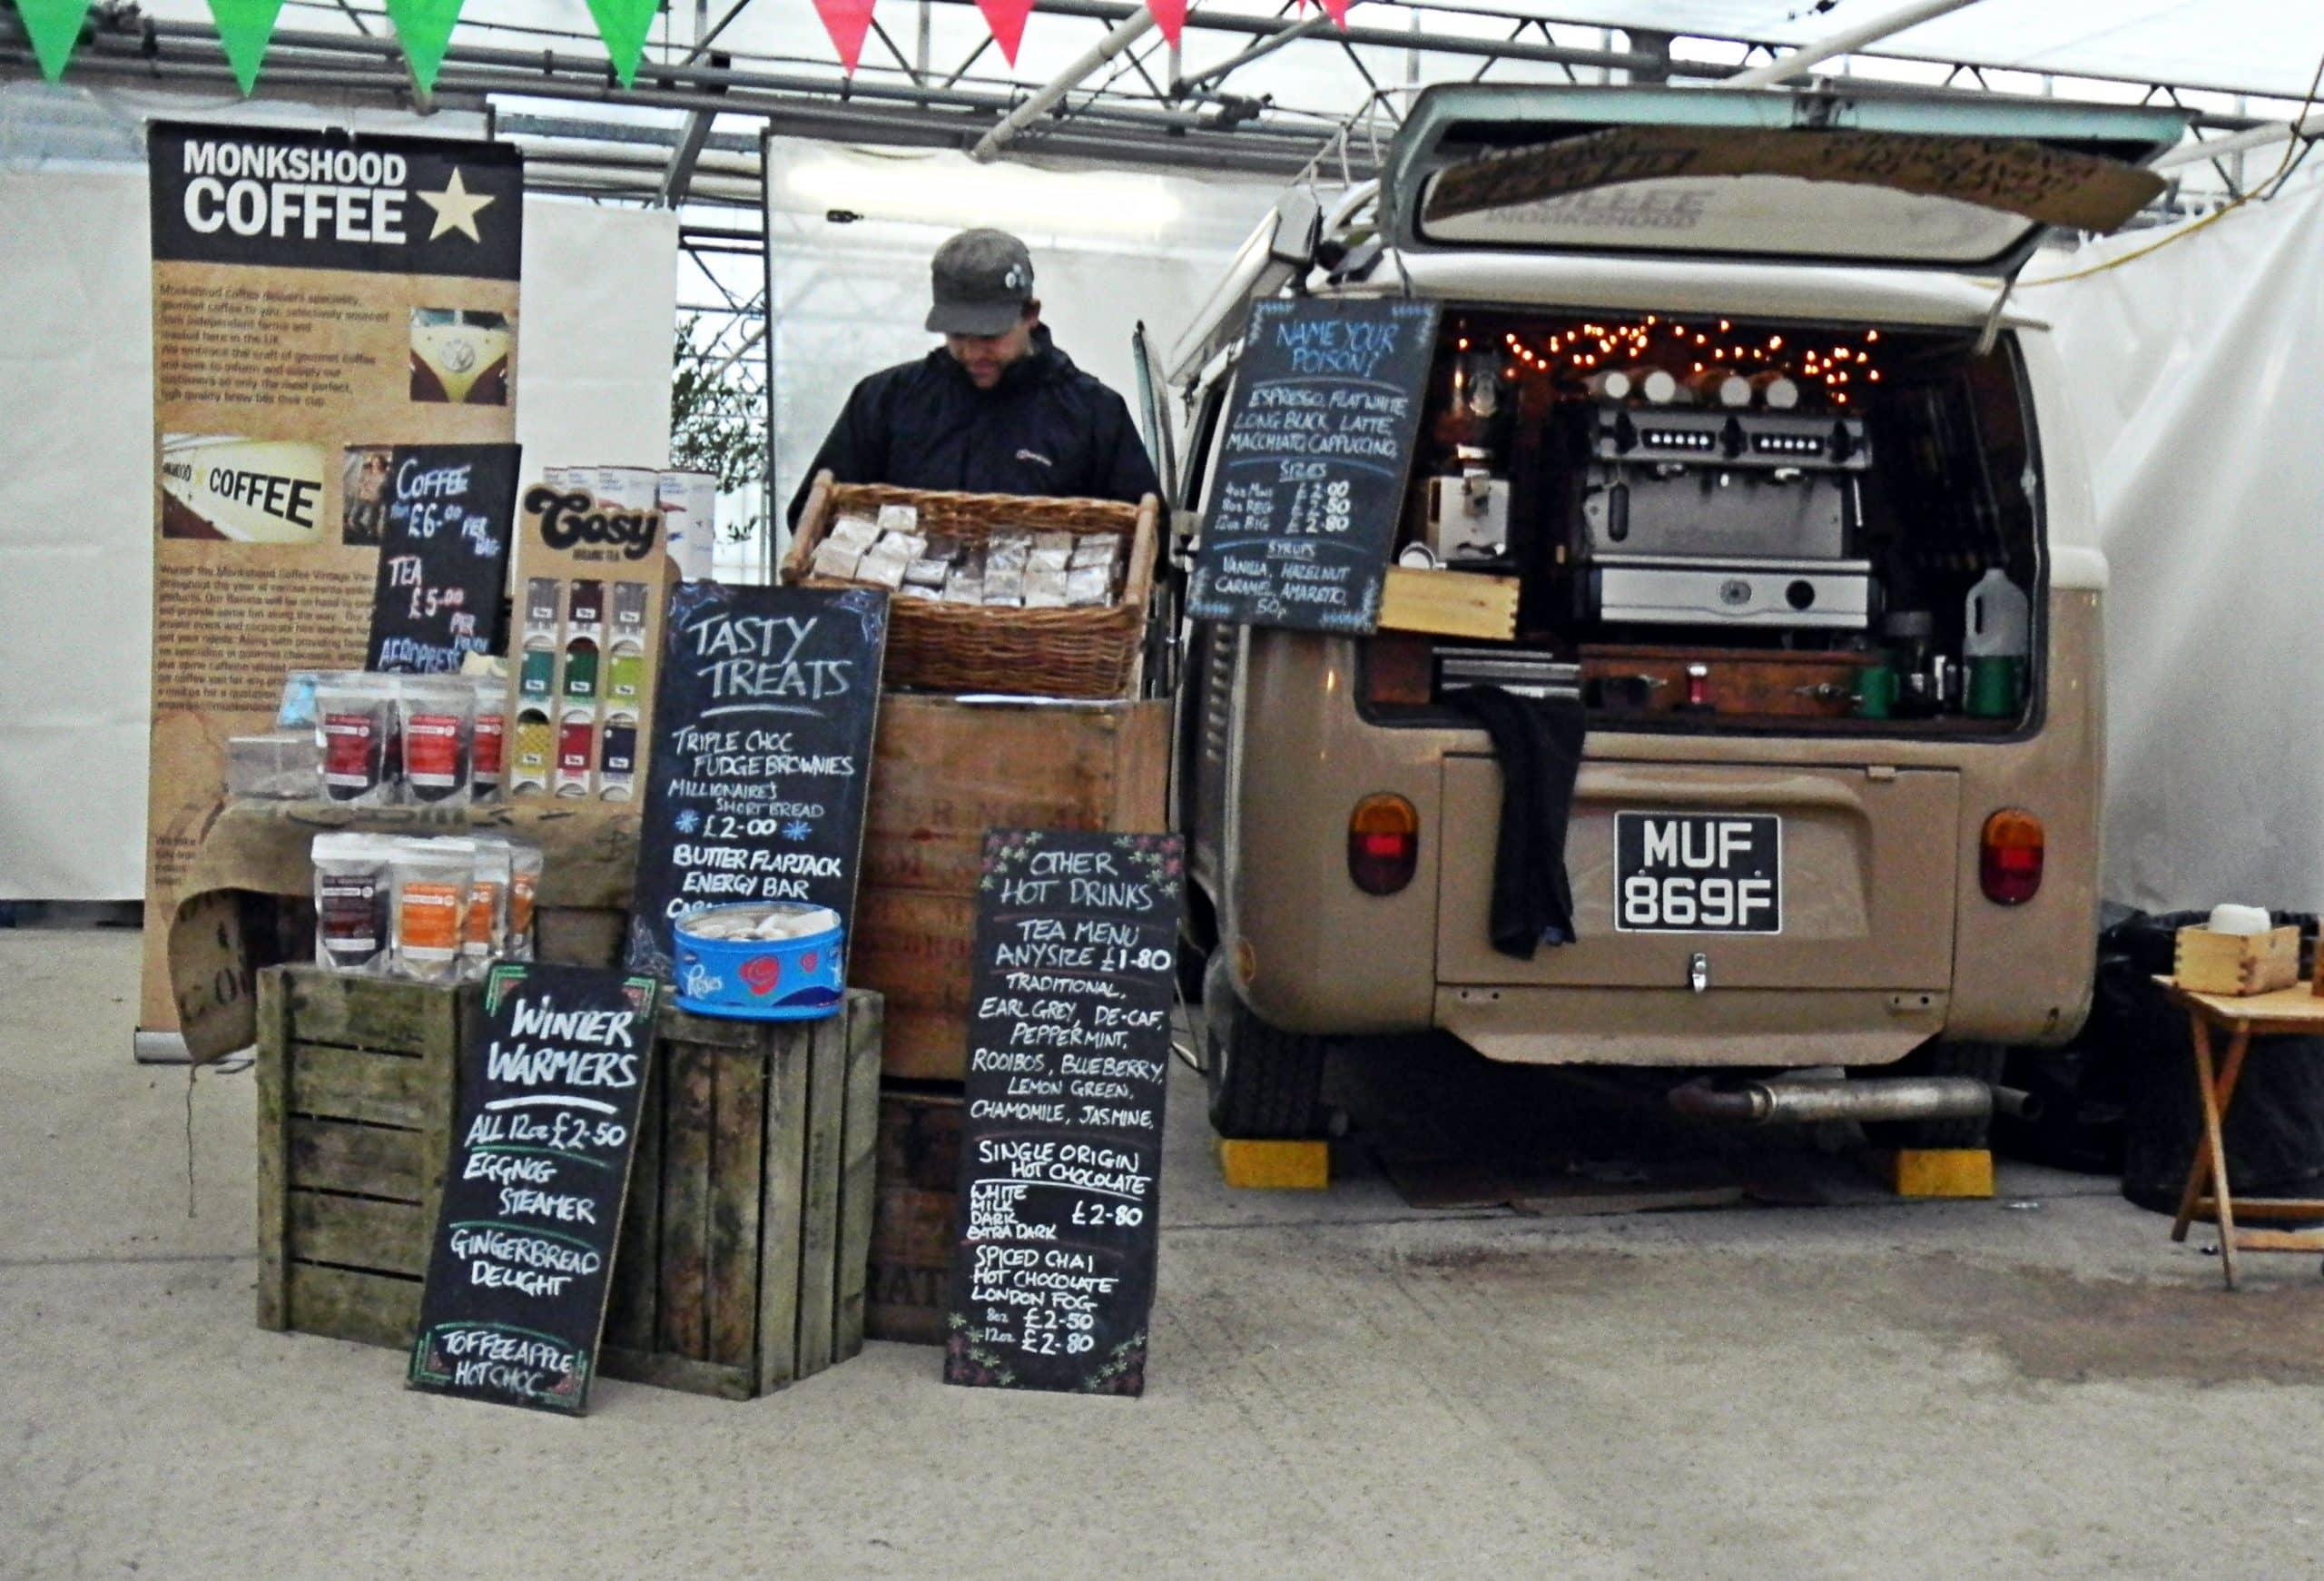 Waddesdon Manor food market monkshood coffee